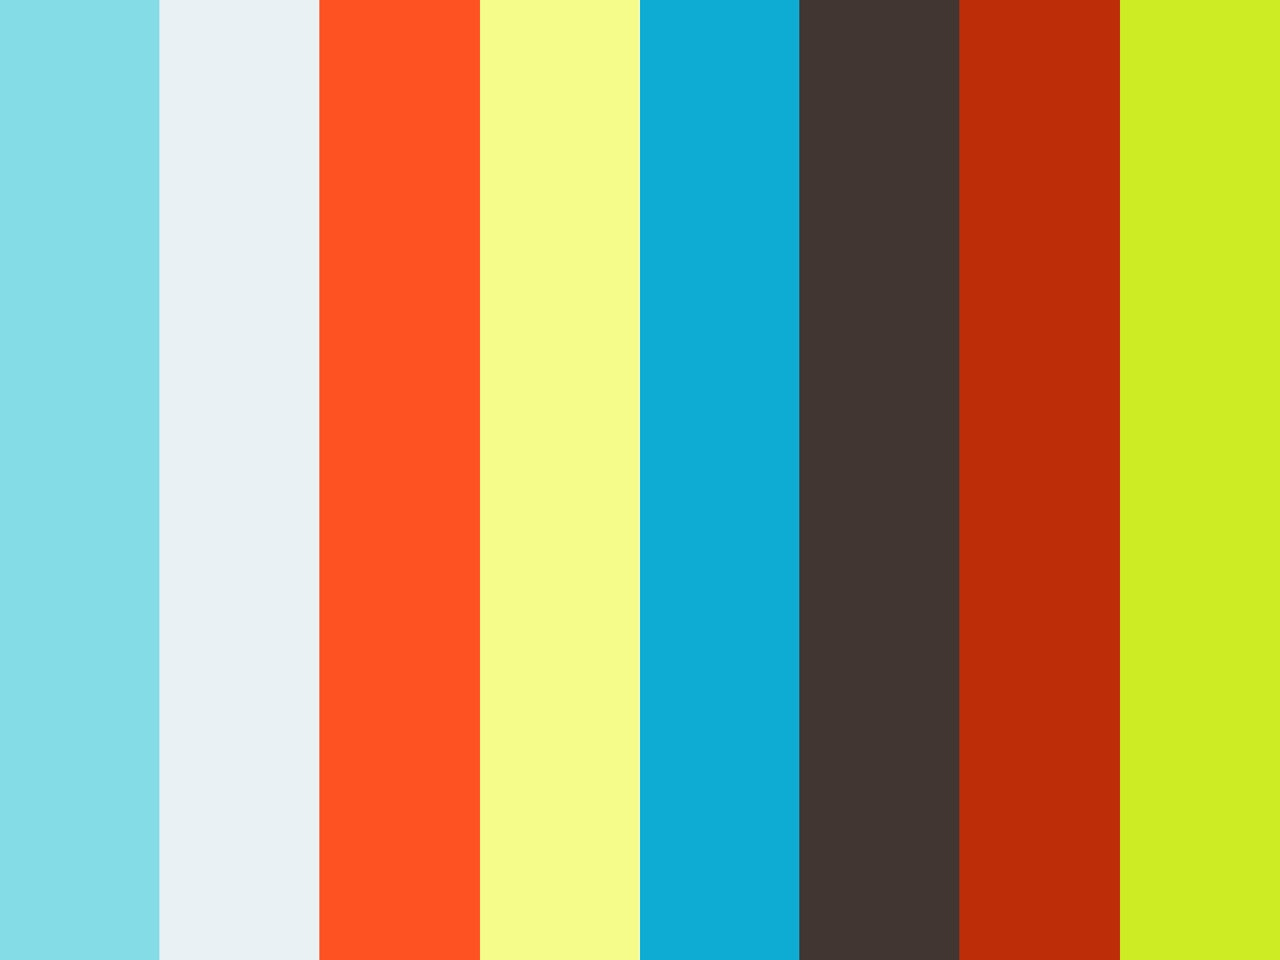 Molokai Covid19 Update - Wednesday, May 6, 2020